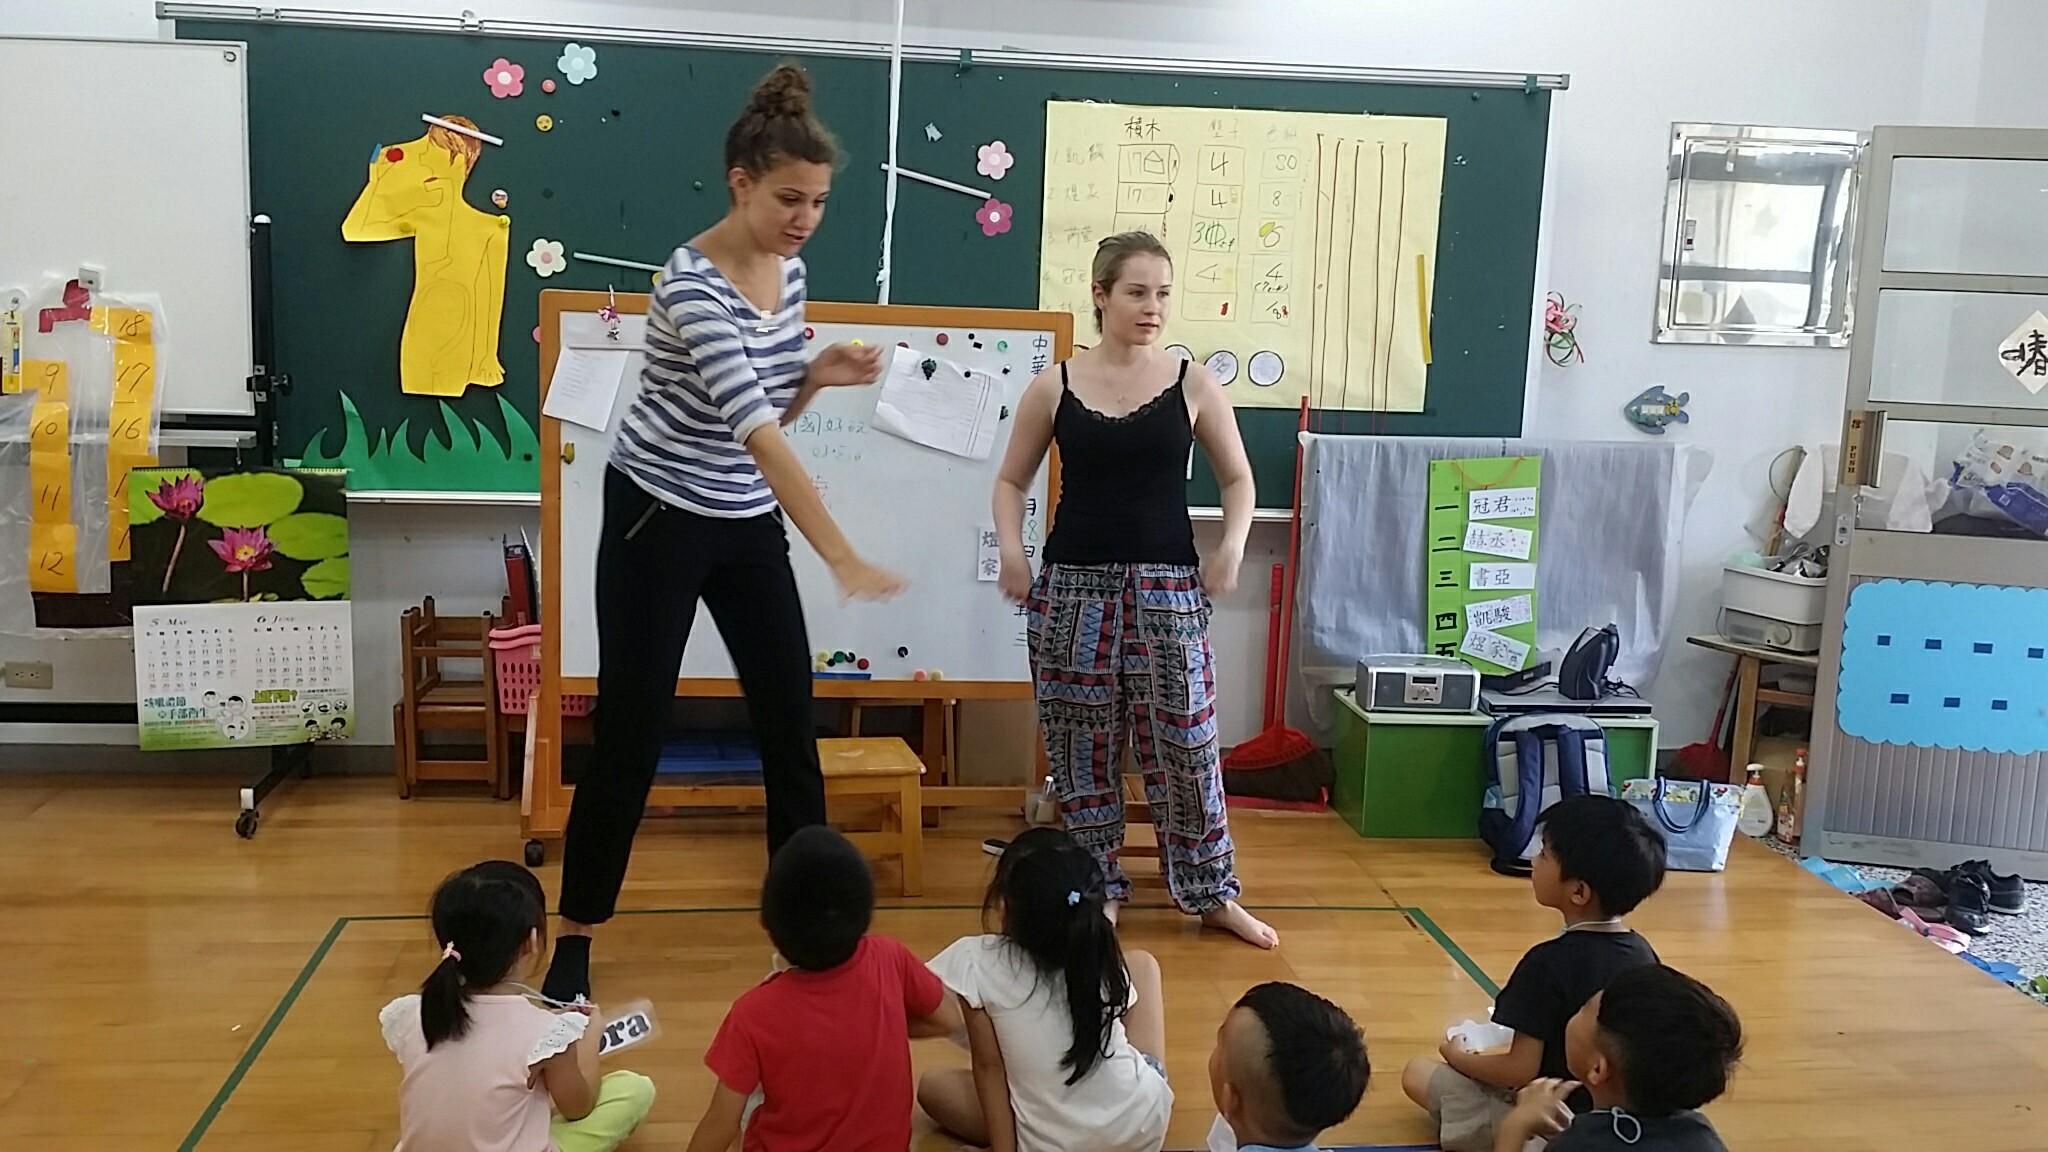 http://www.tses.cyc.edu.tw/uploads/tadgallery/2017_06_30/3842_國際志工幼兒園_170630_0002.jpg